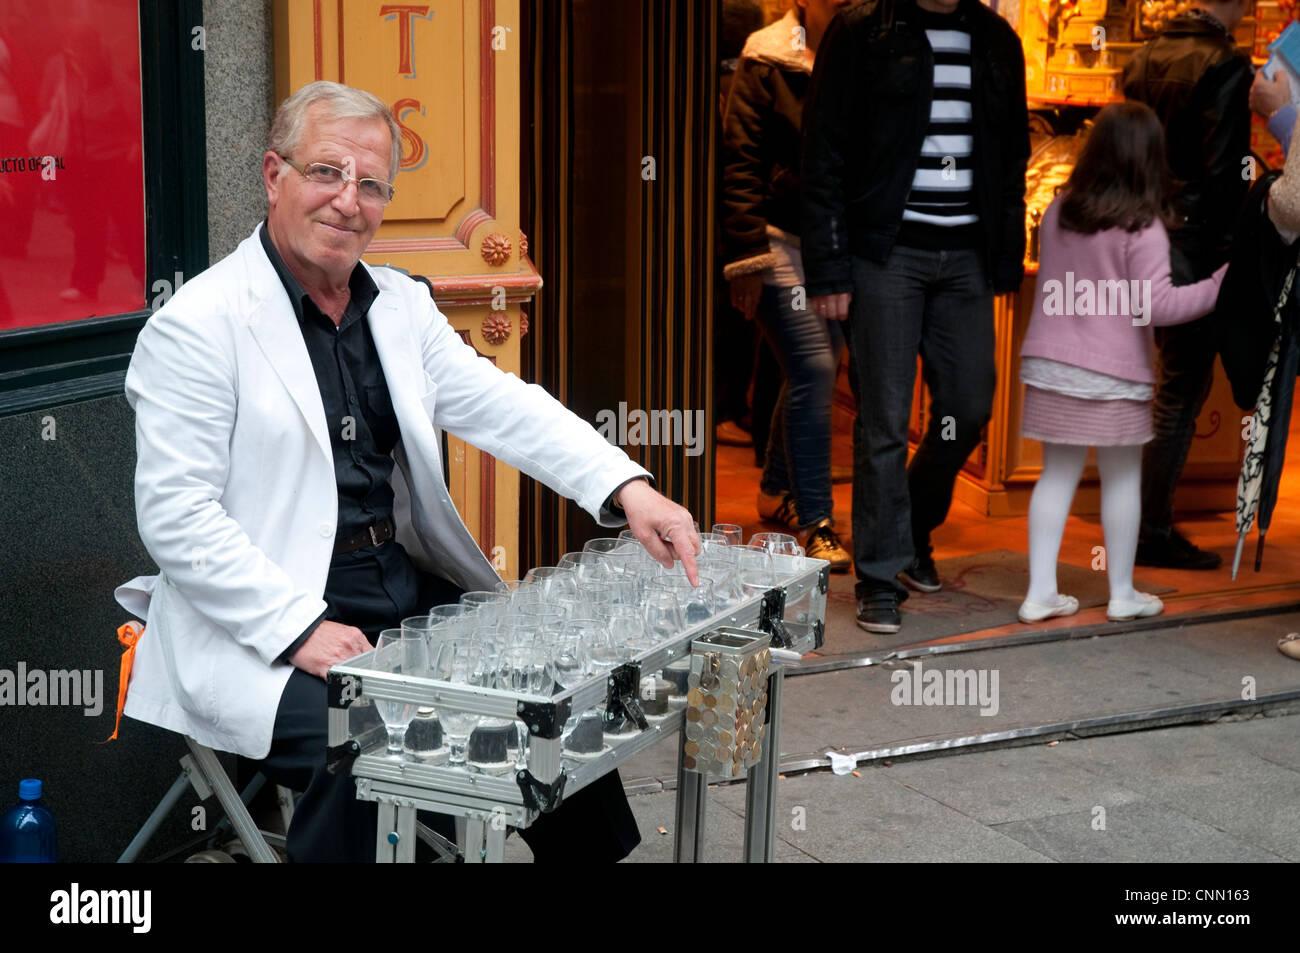 Street musician. Madrid, Spain. - Stock Image